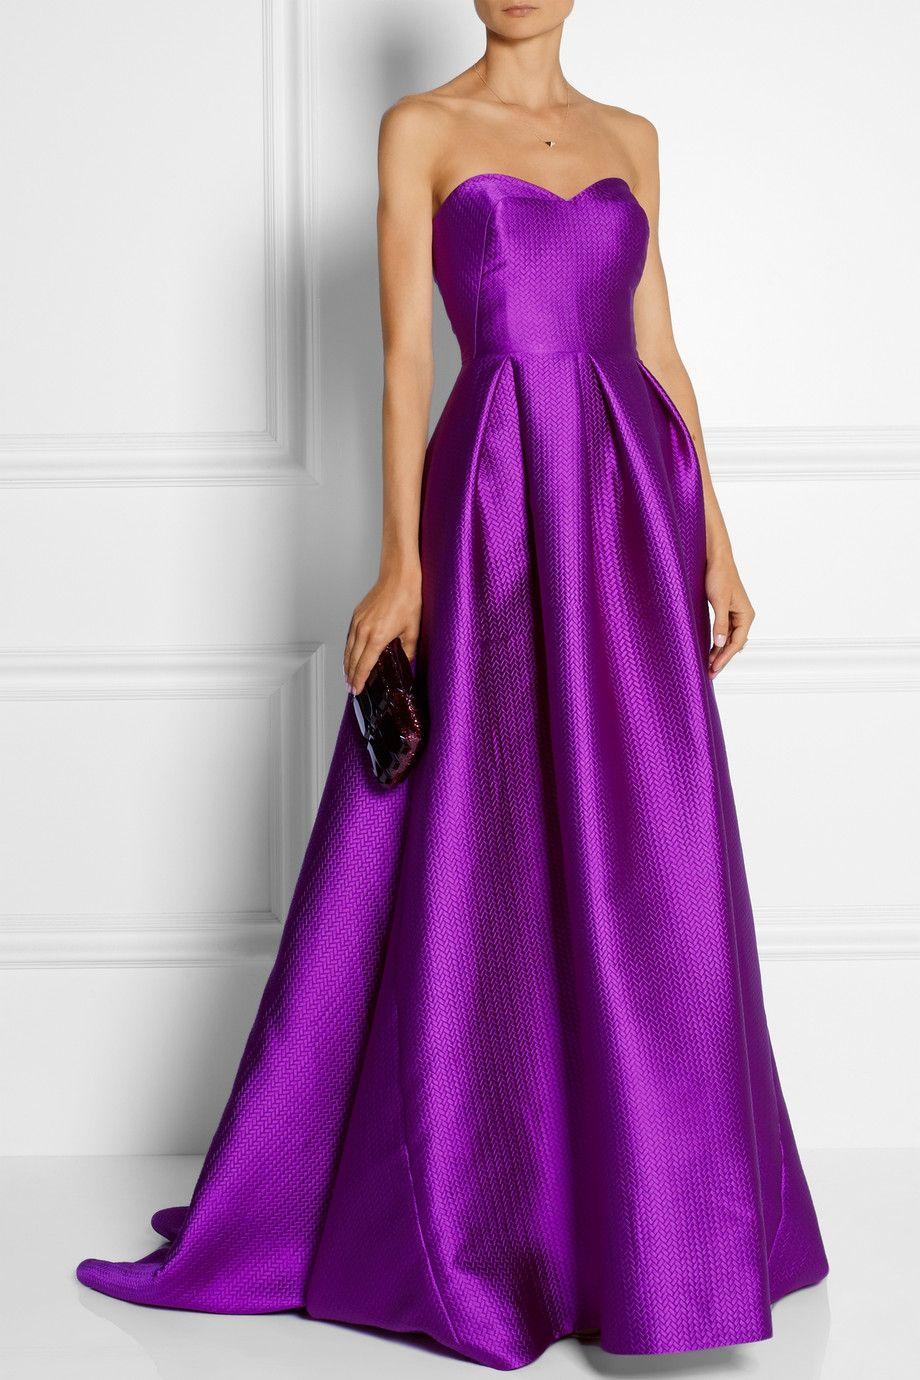 Lela Rose   Embossed satin gown   NET-A-PORTER.COM   Vestidos ...